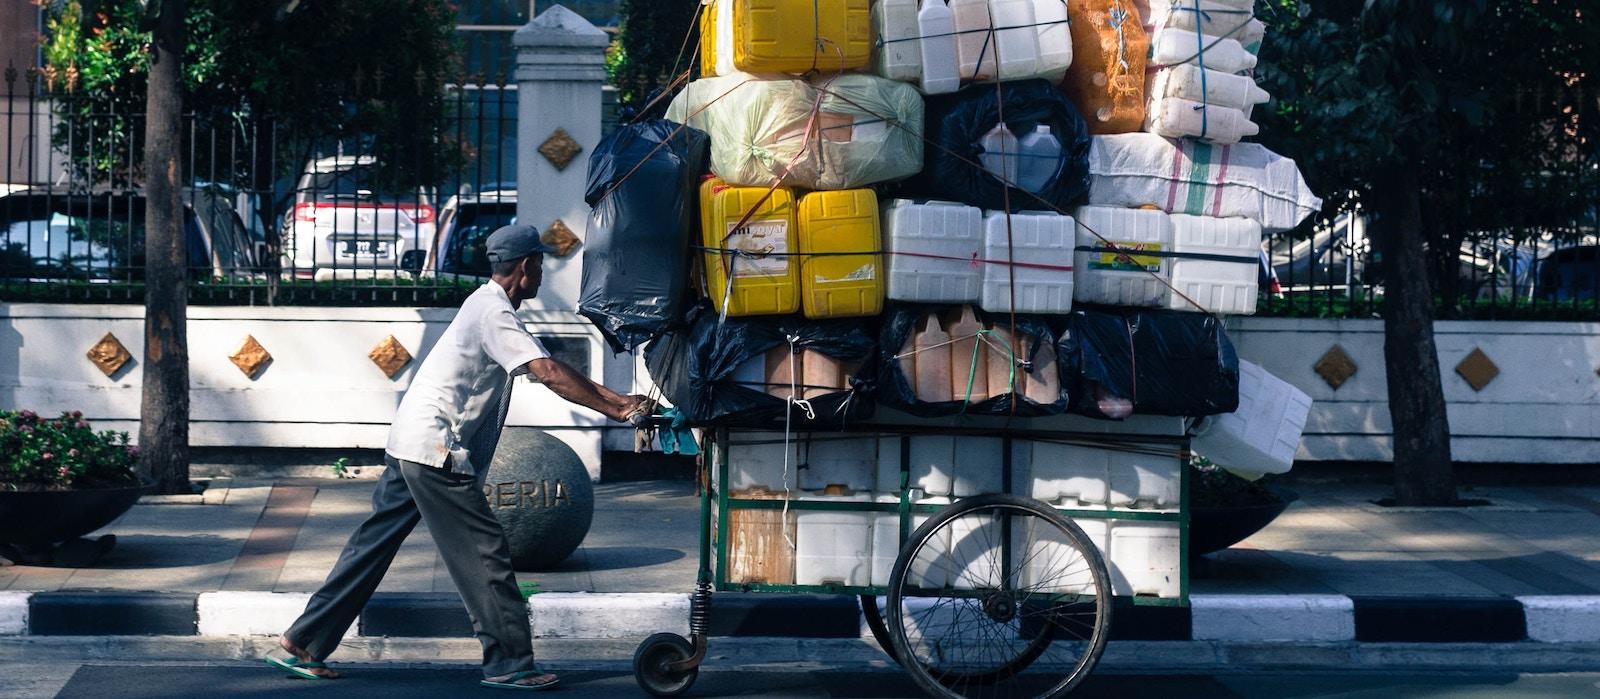 Street vendor, Jakarta (Photo: Sander Wehkamp/ Unsplash)